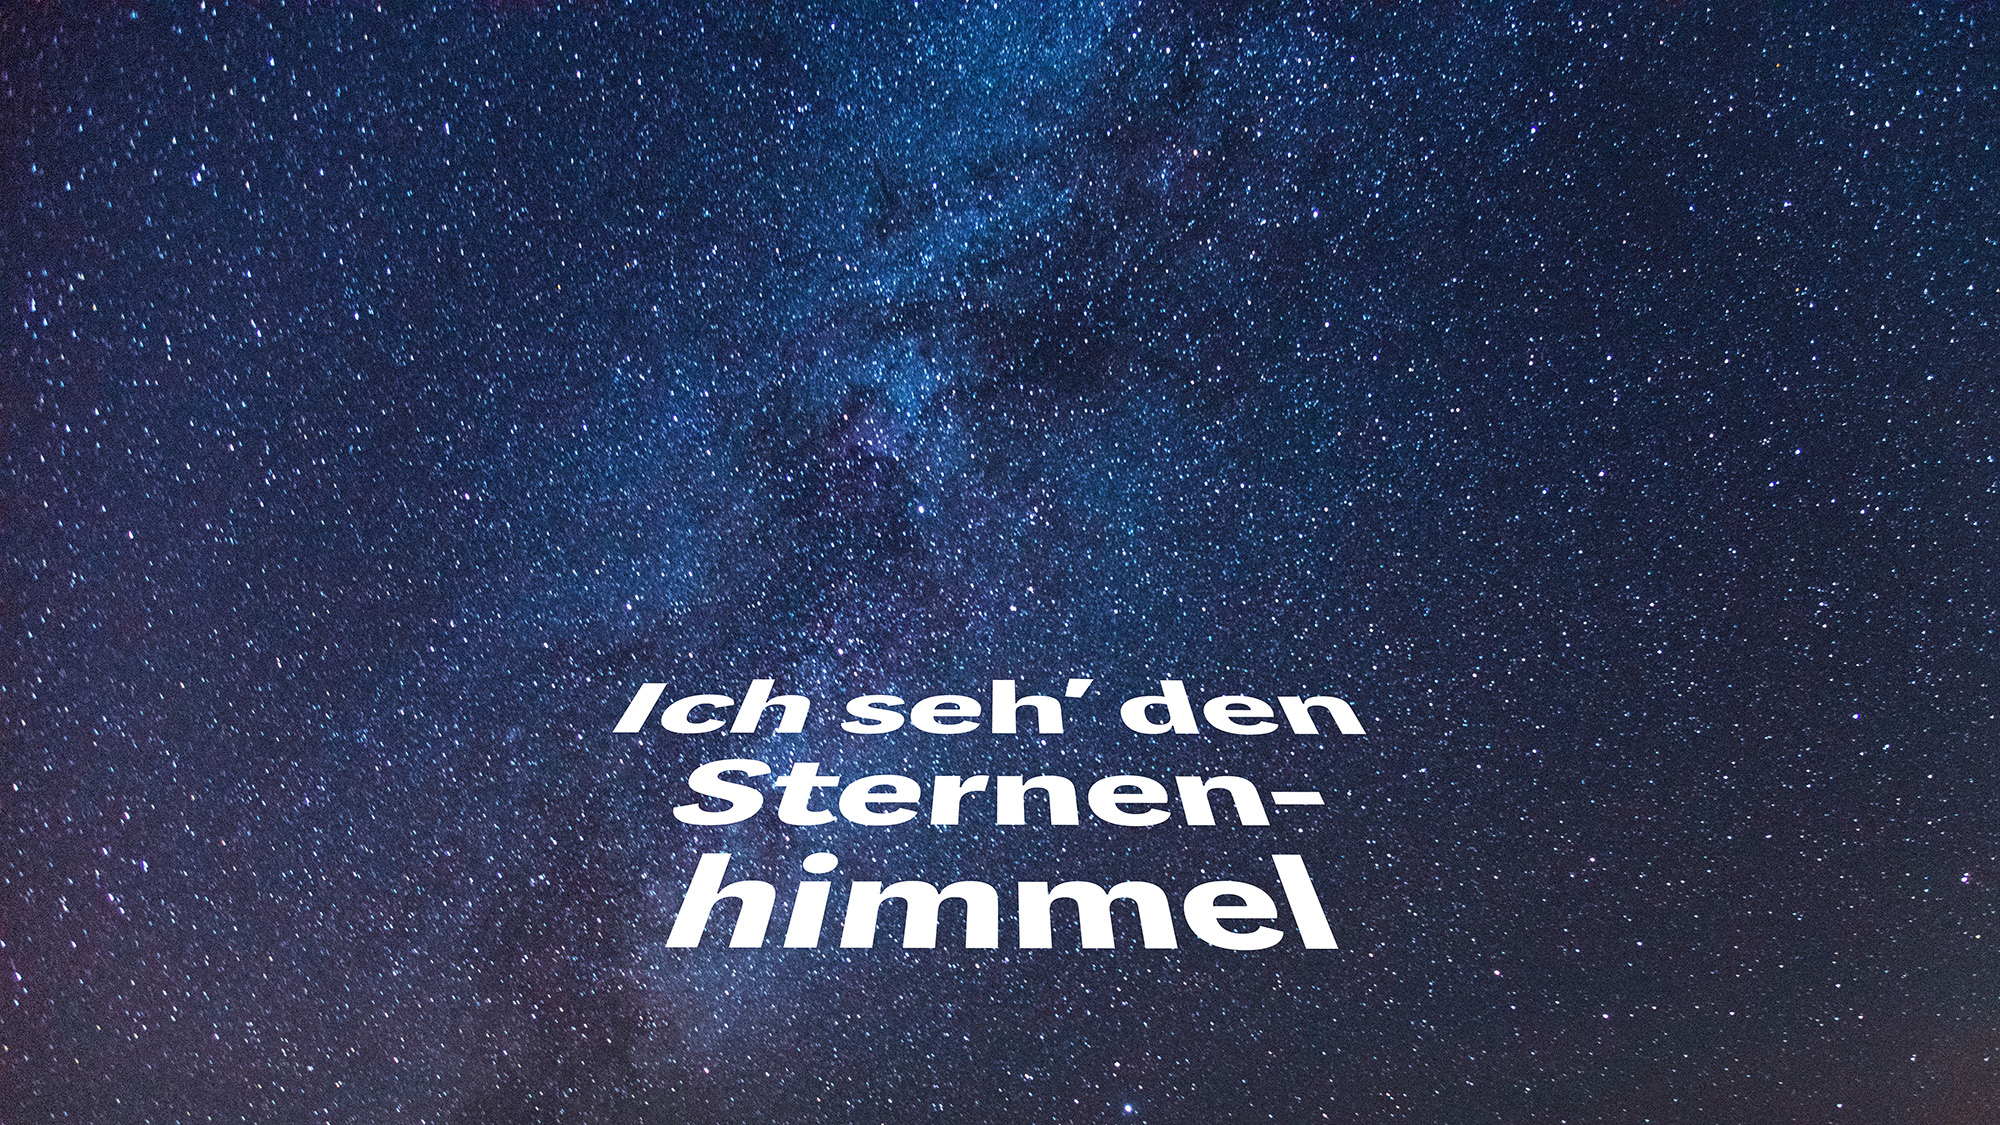 #14: Ich seh den Sternenhimmel